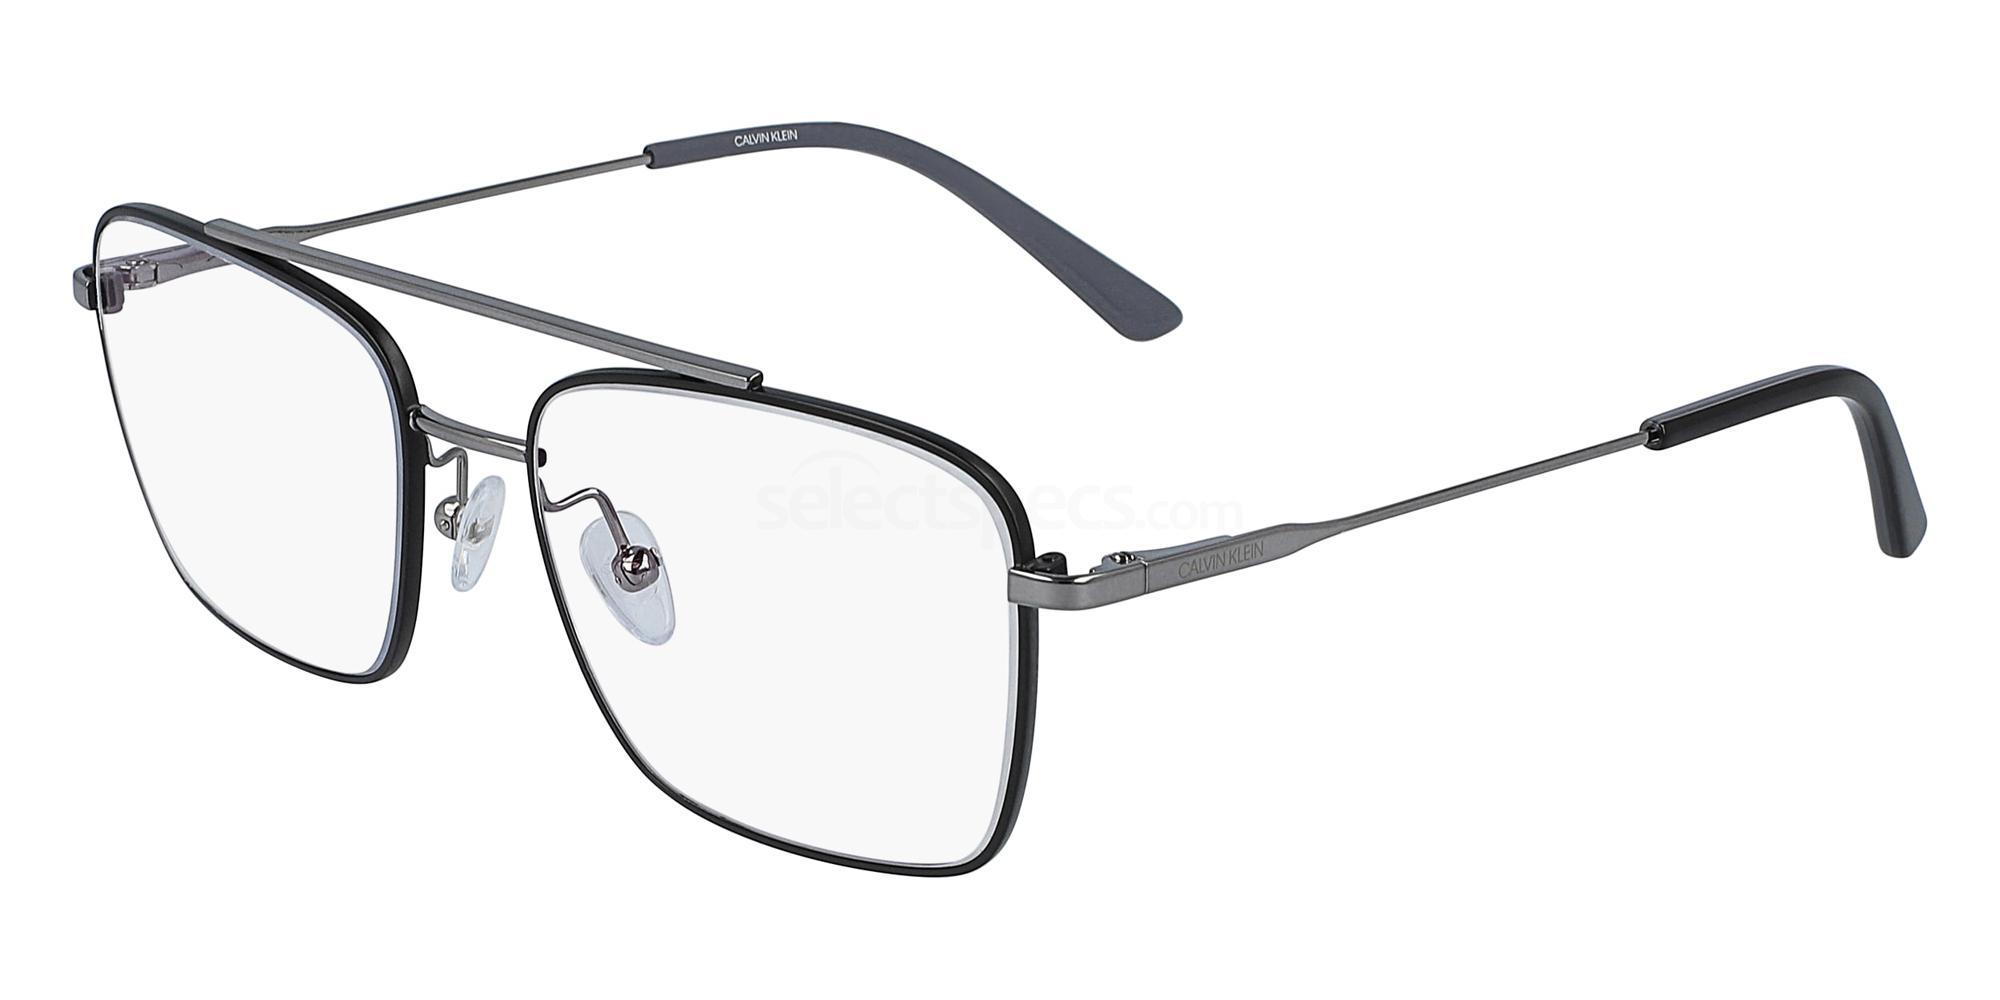 001 CK19104 Glasses, Calvin Klein